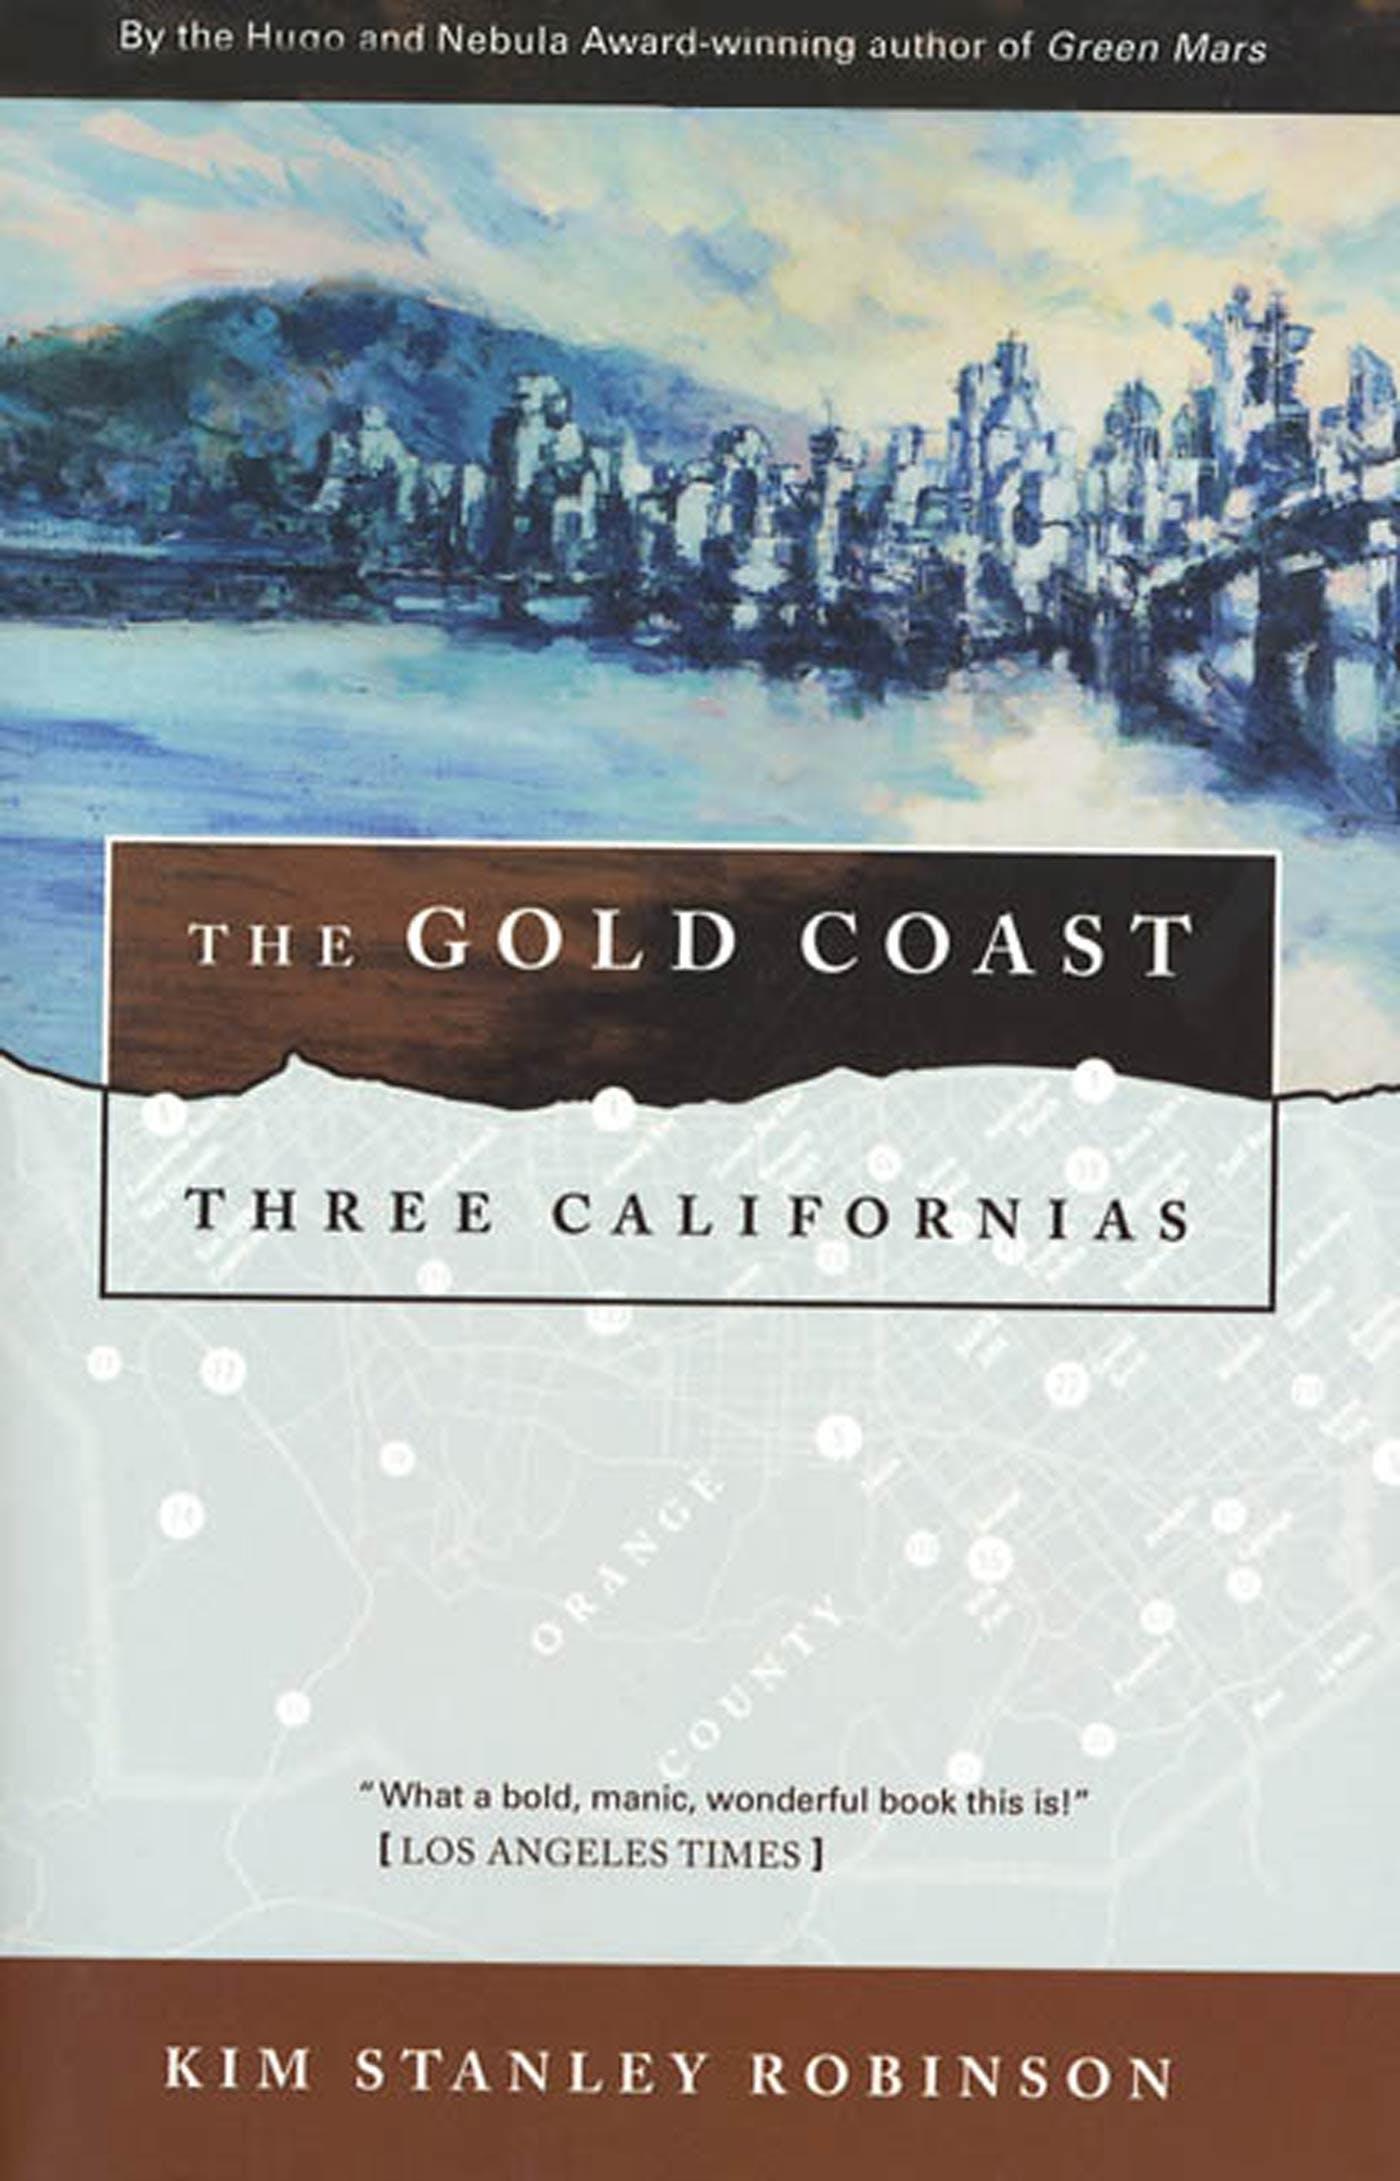 Image of The Gold Coast